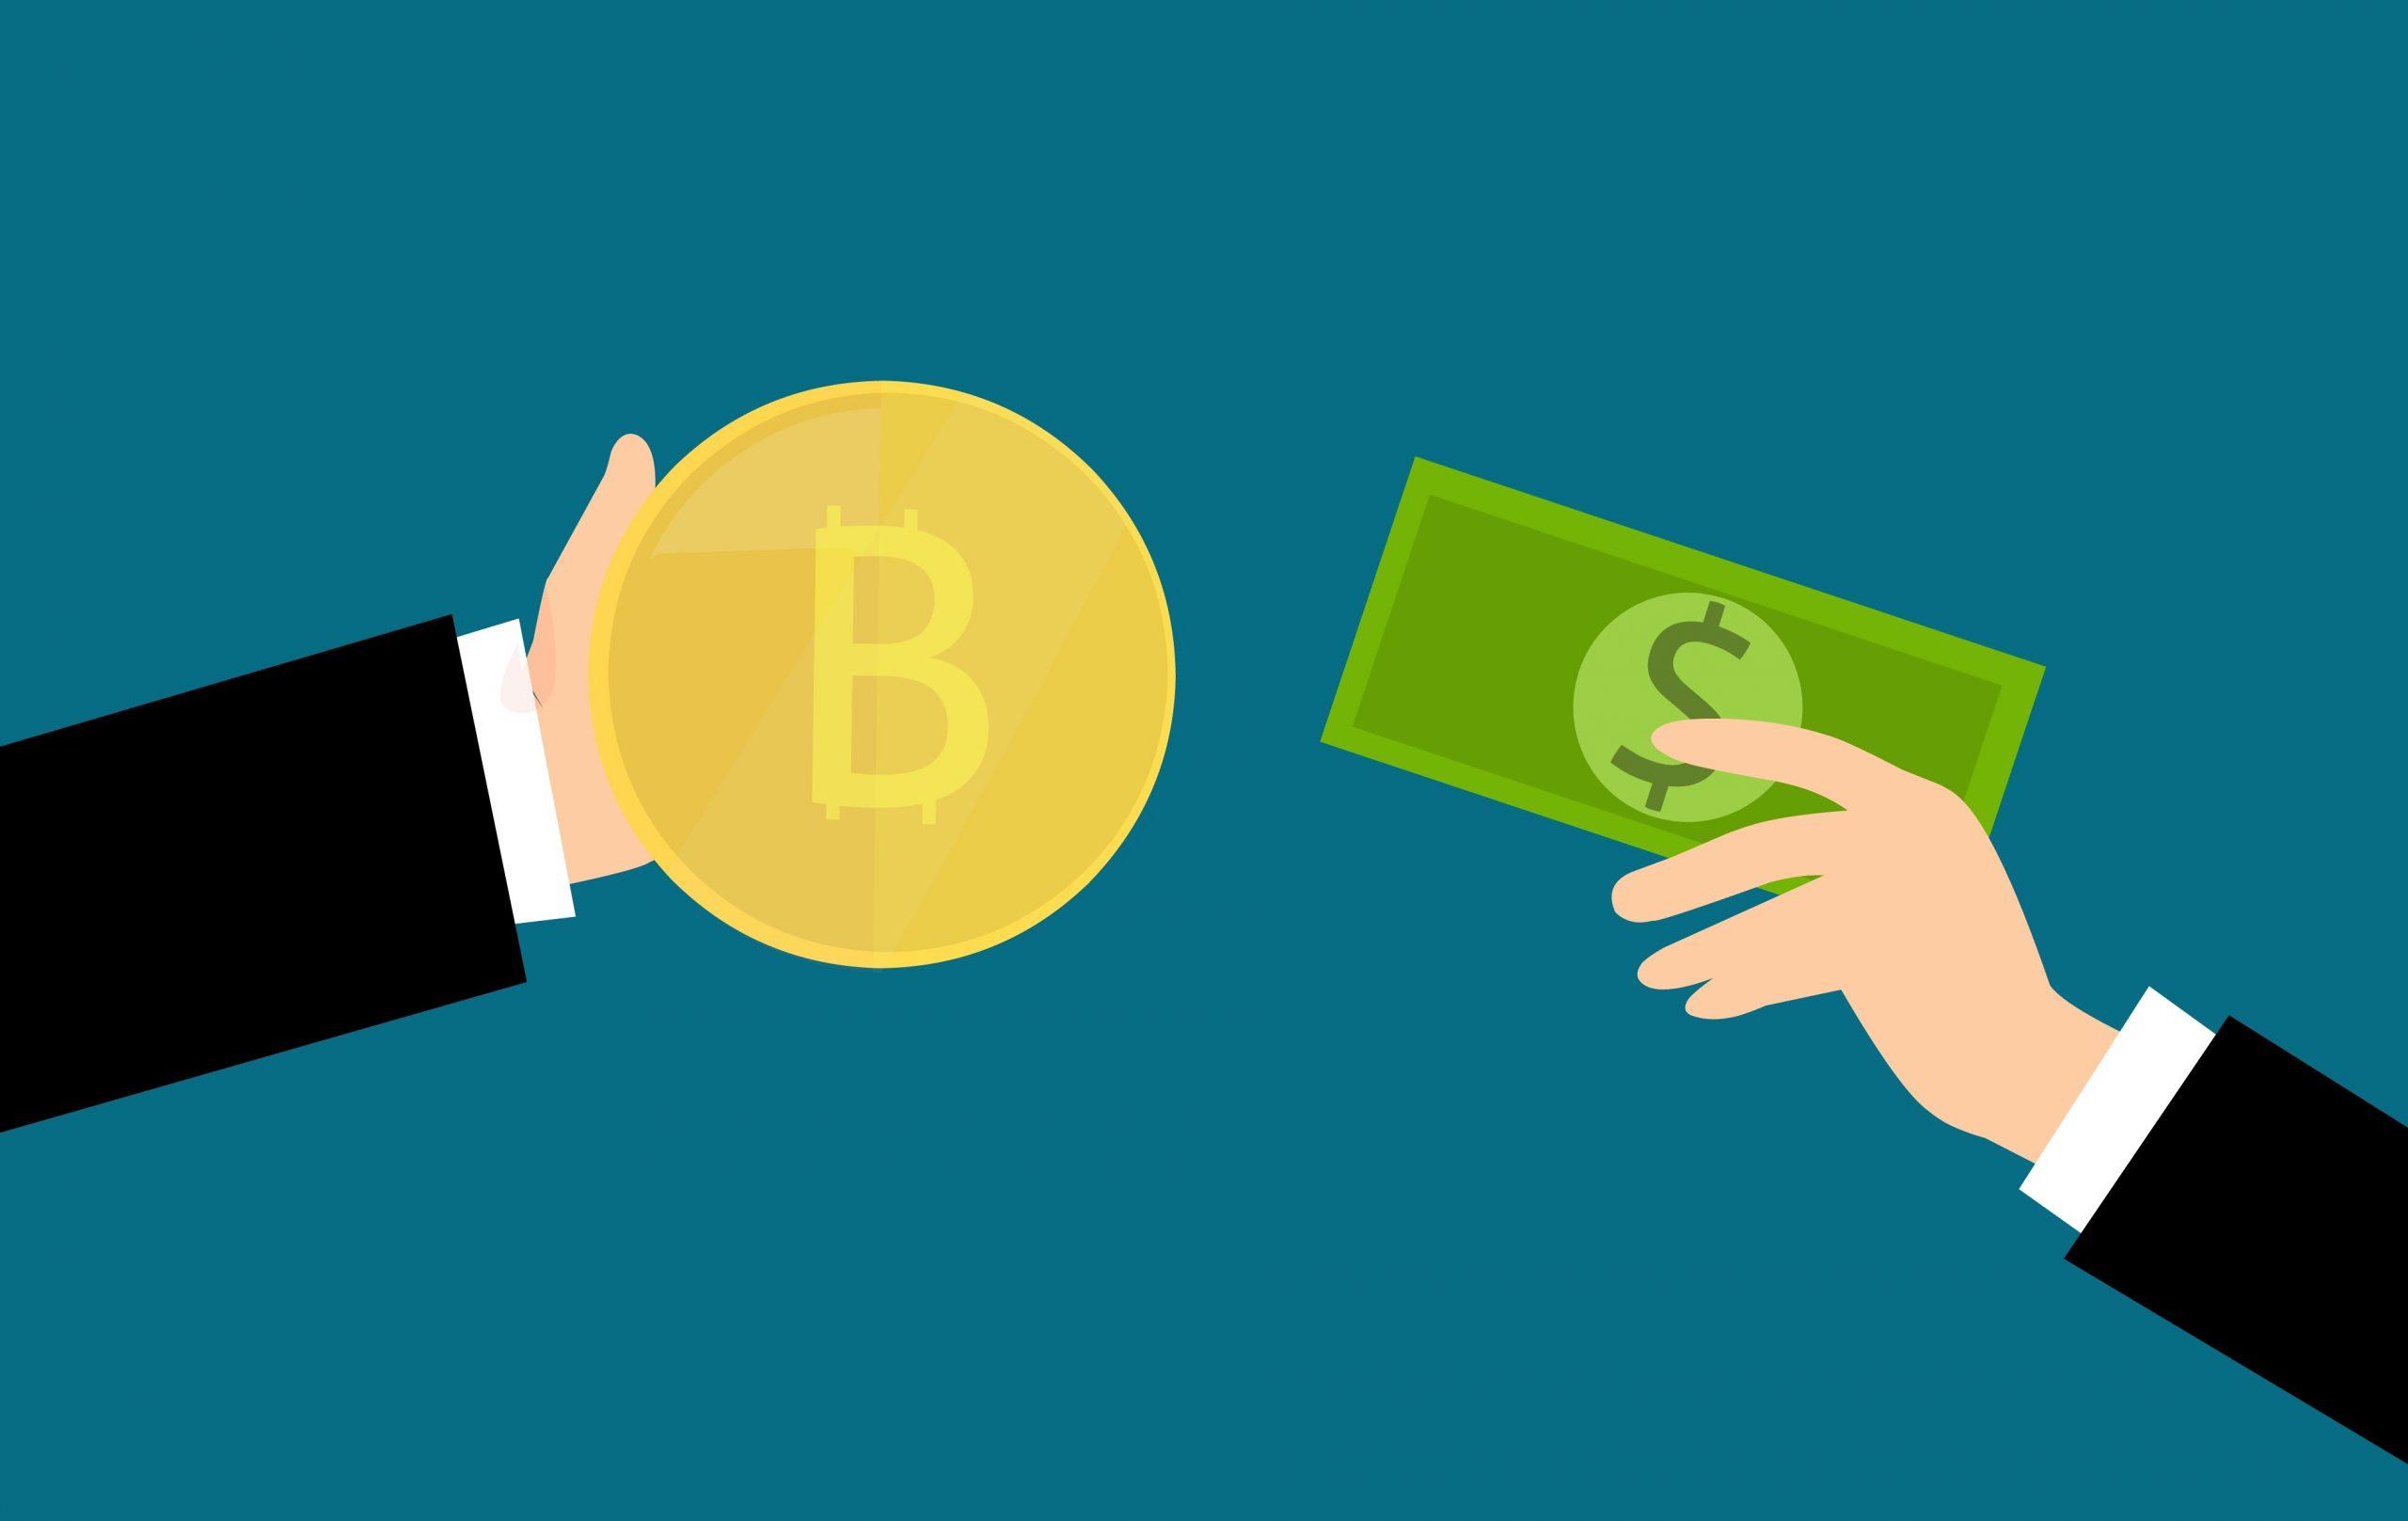 How Can I Buy Bitcoin?